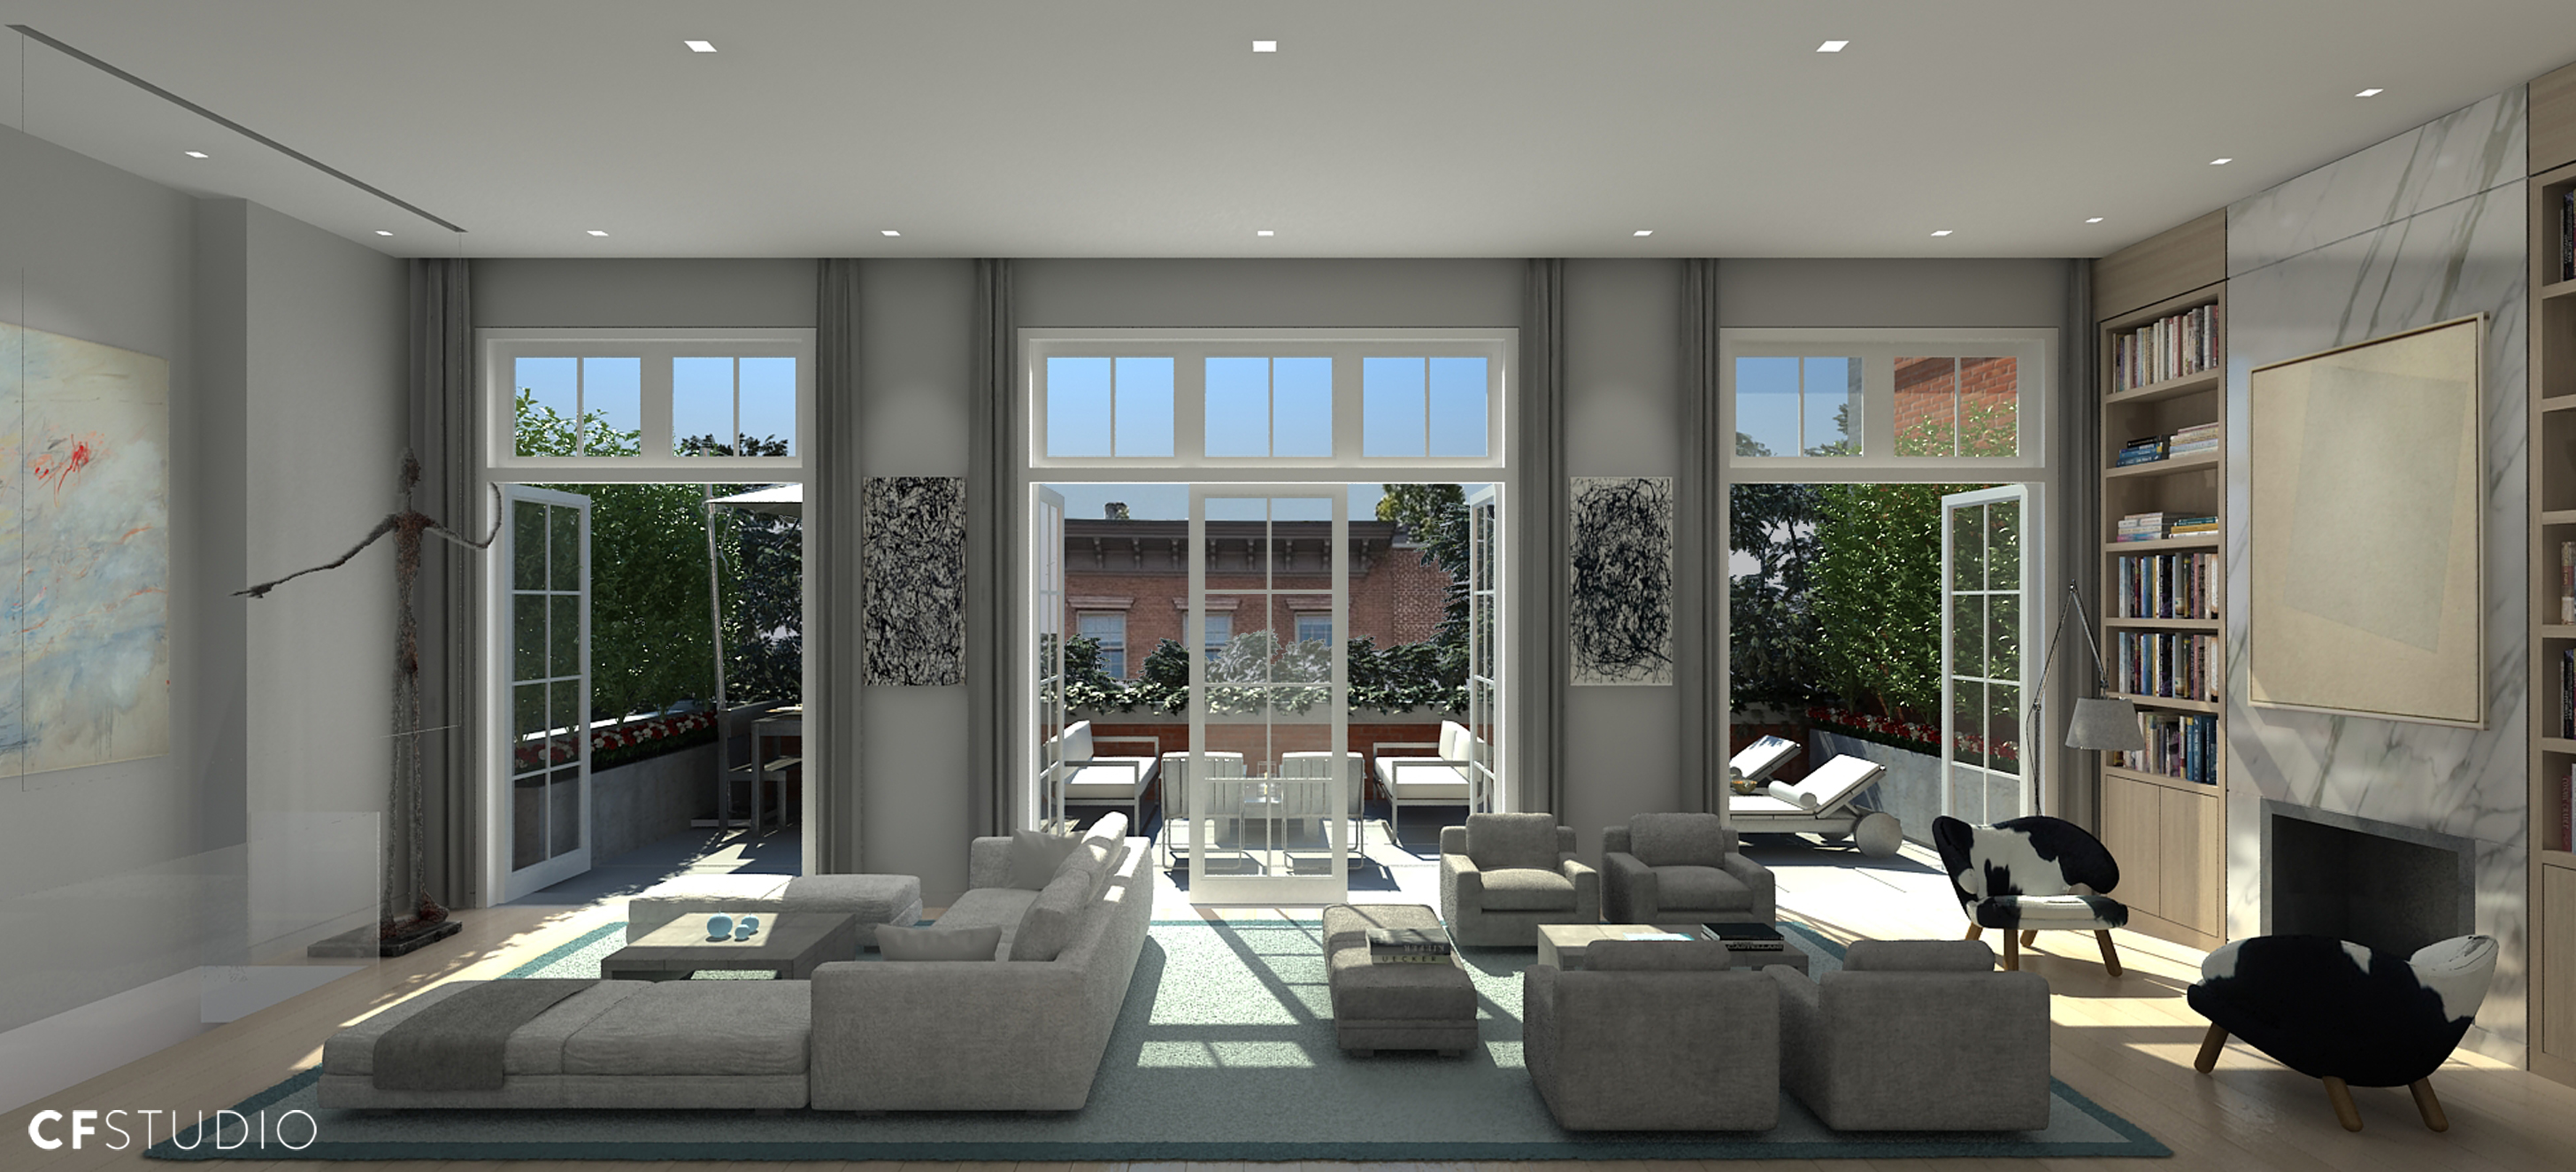 6th Floor Apartment Living Room